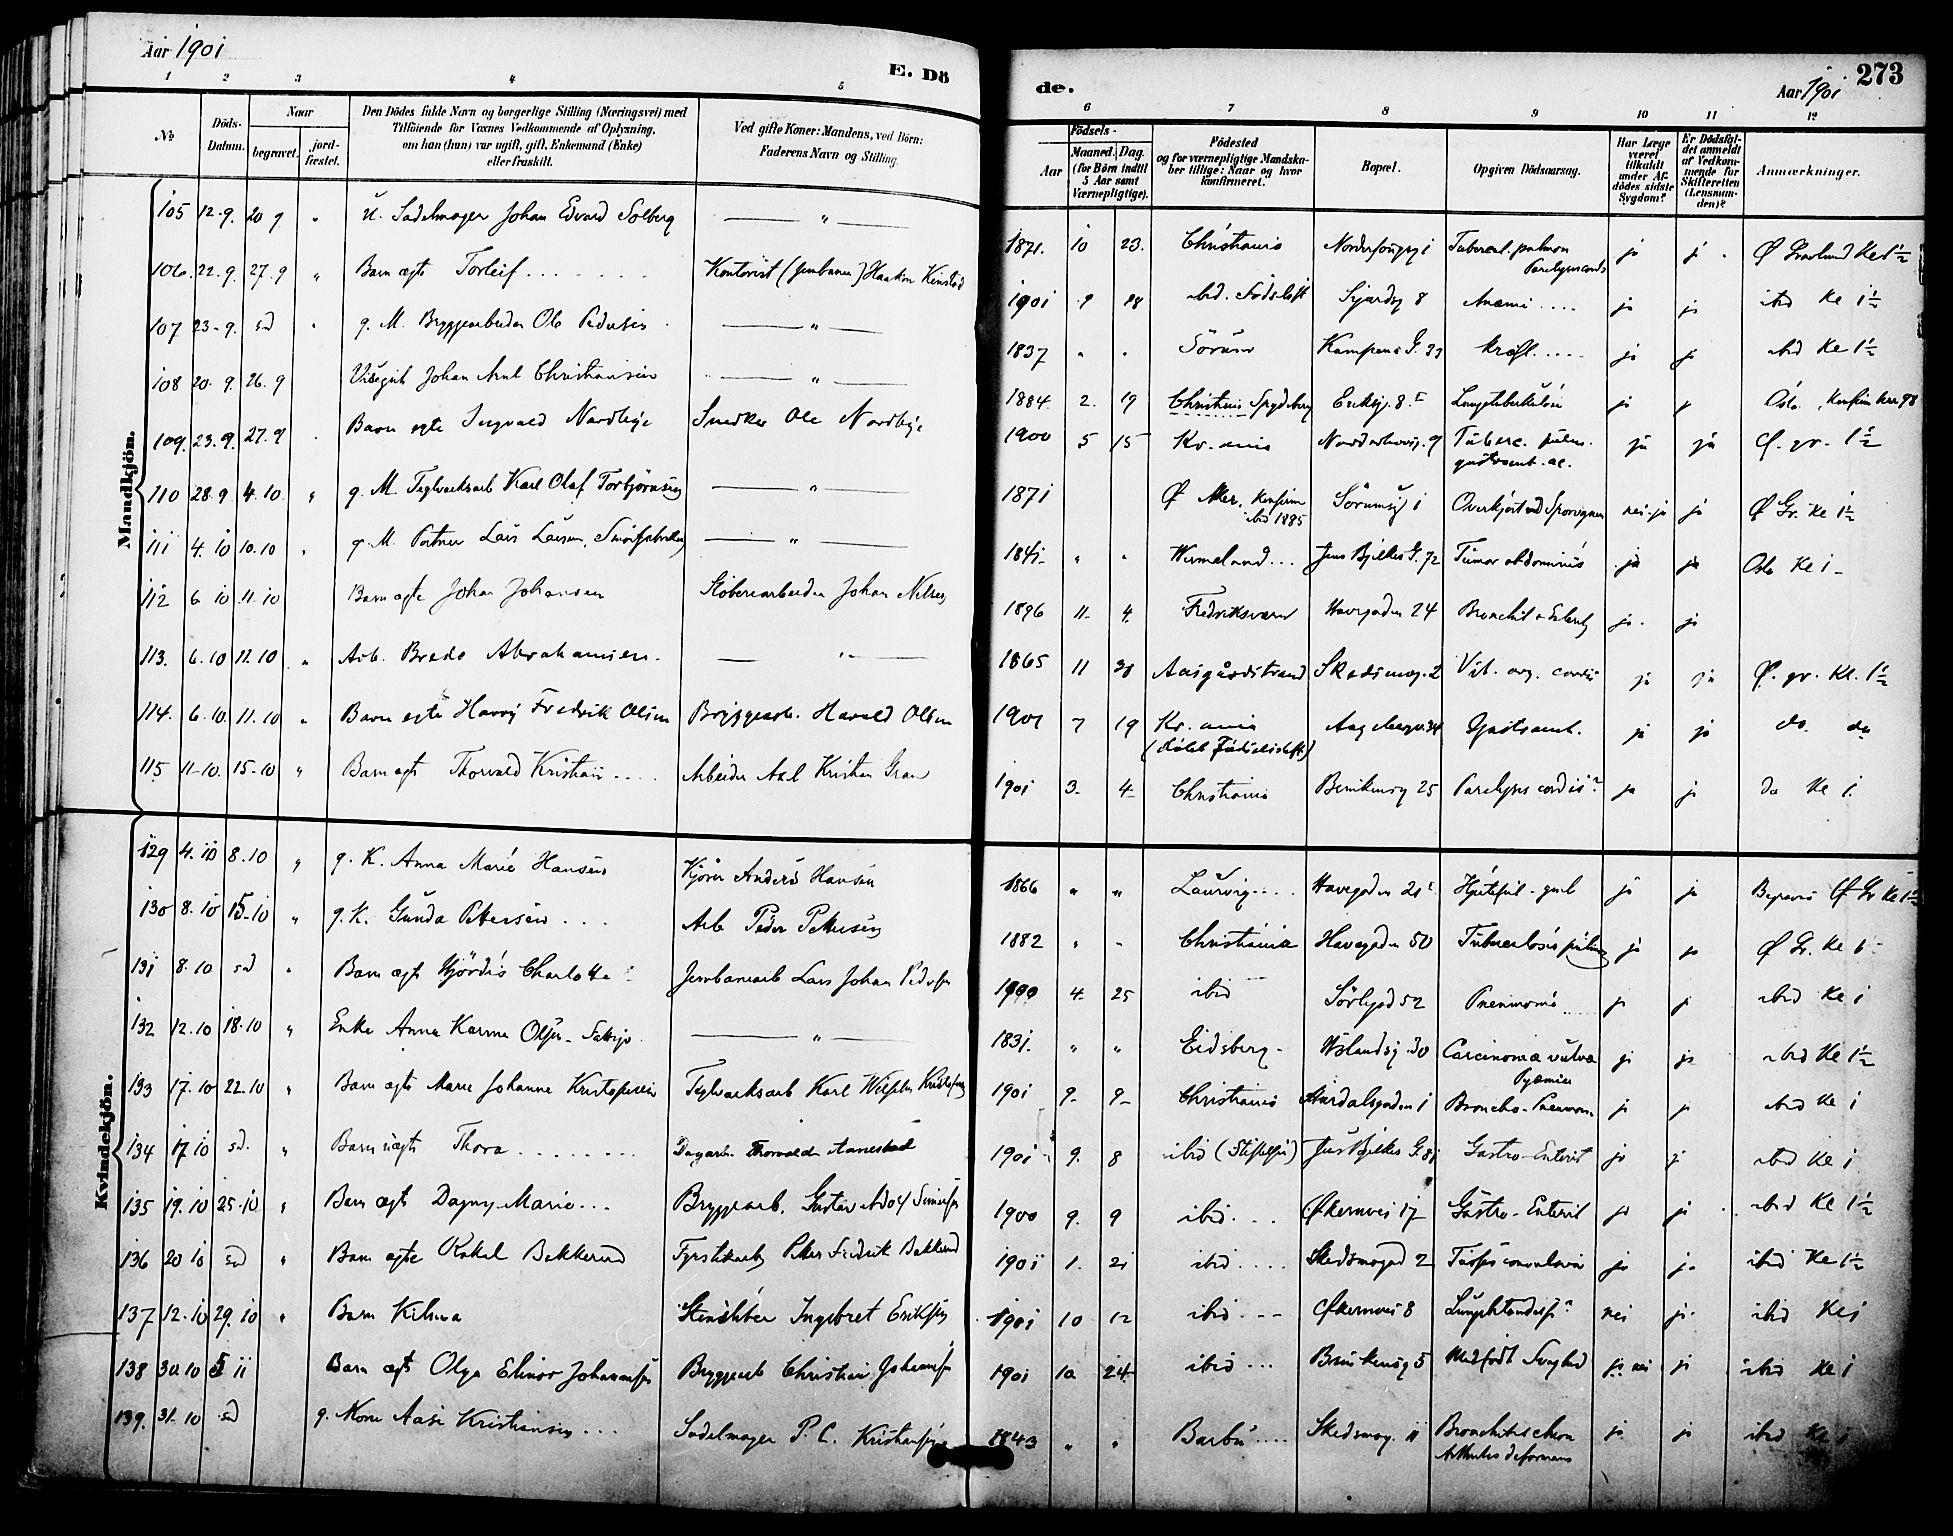 SAO, Kampen prestekontor Kirkebøker, F/Fa/L0008: Parish register (official) no. I 8, 1892-1902, p. 273